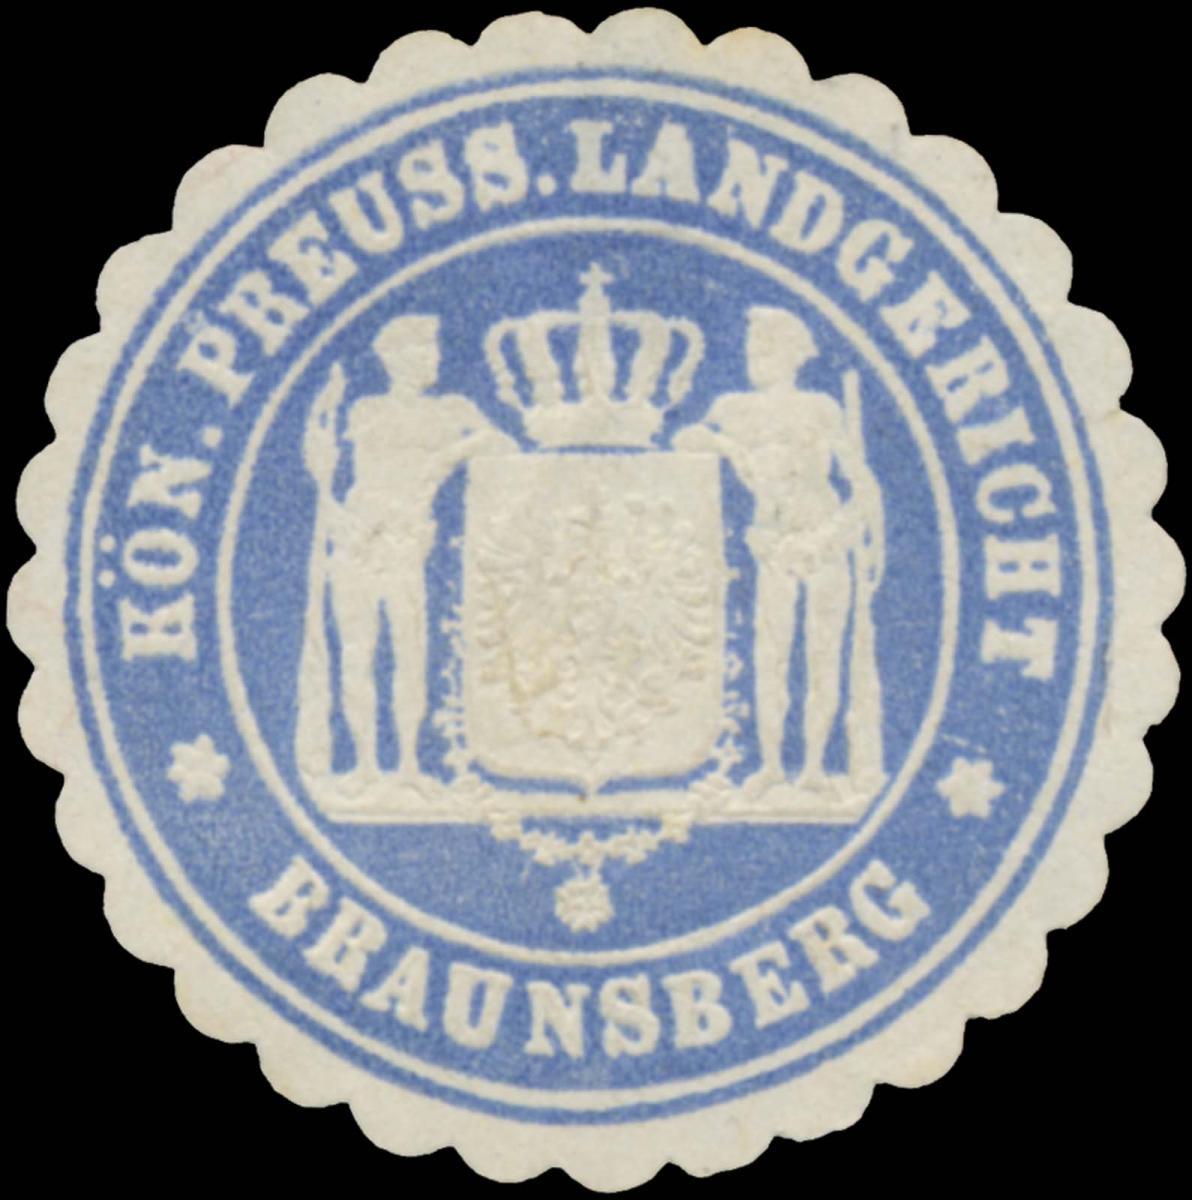 K.Pr. Landgericht Braunsberg/Ostpreußen